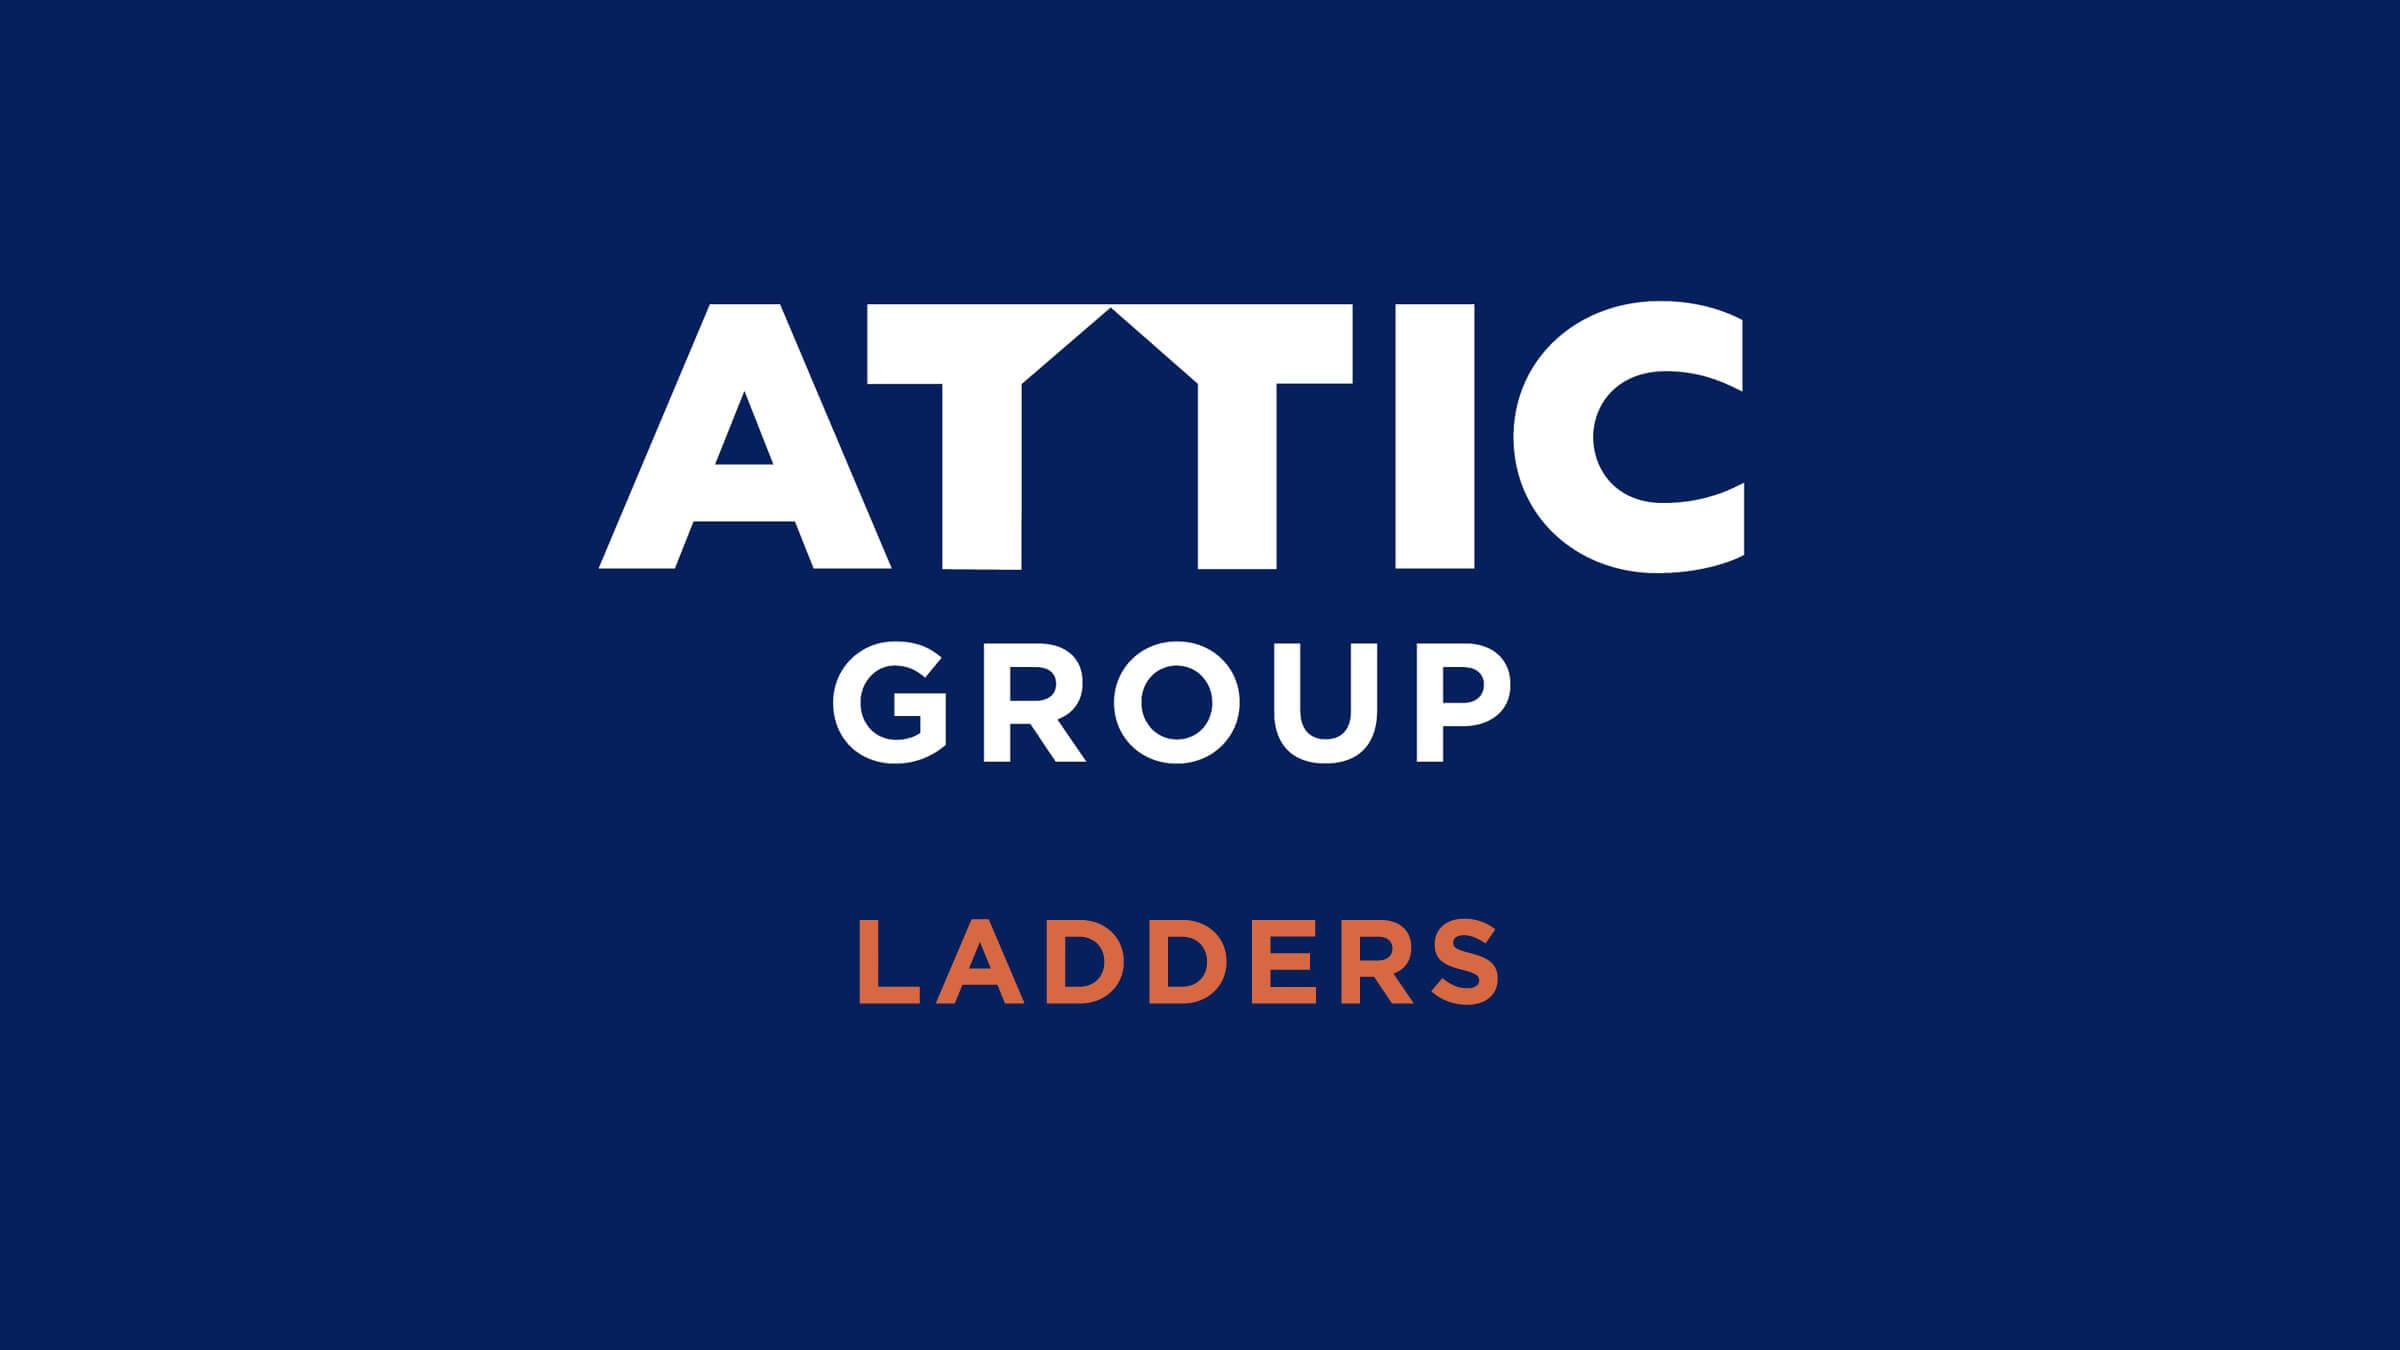 IMG 1_Attic Ladders.jpg